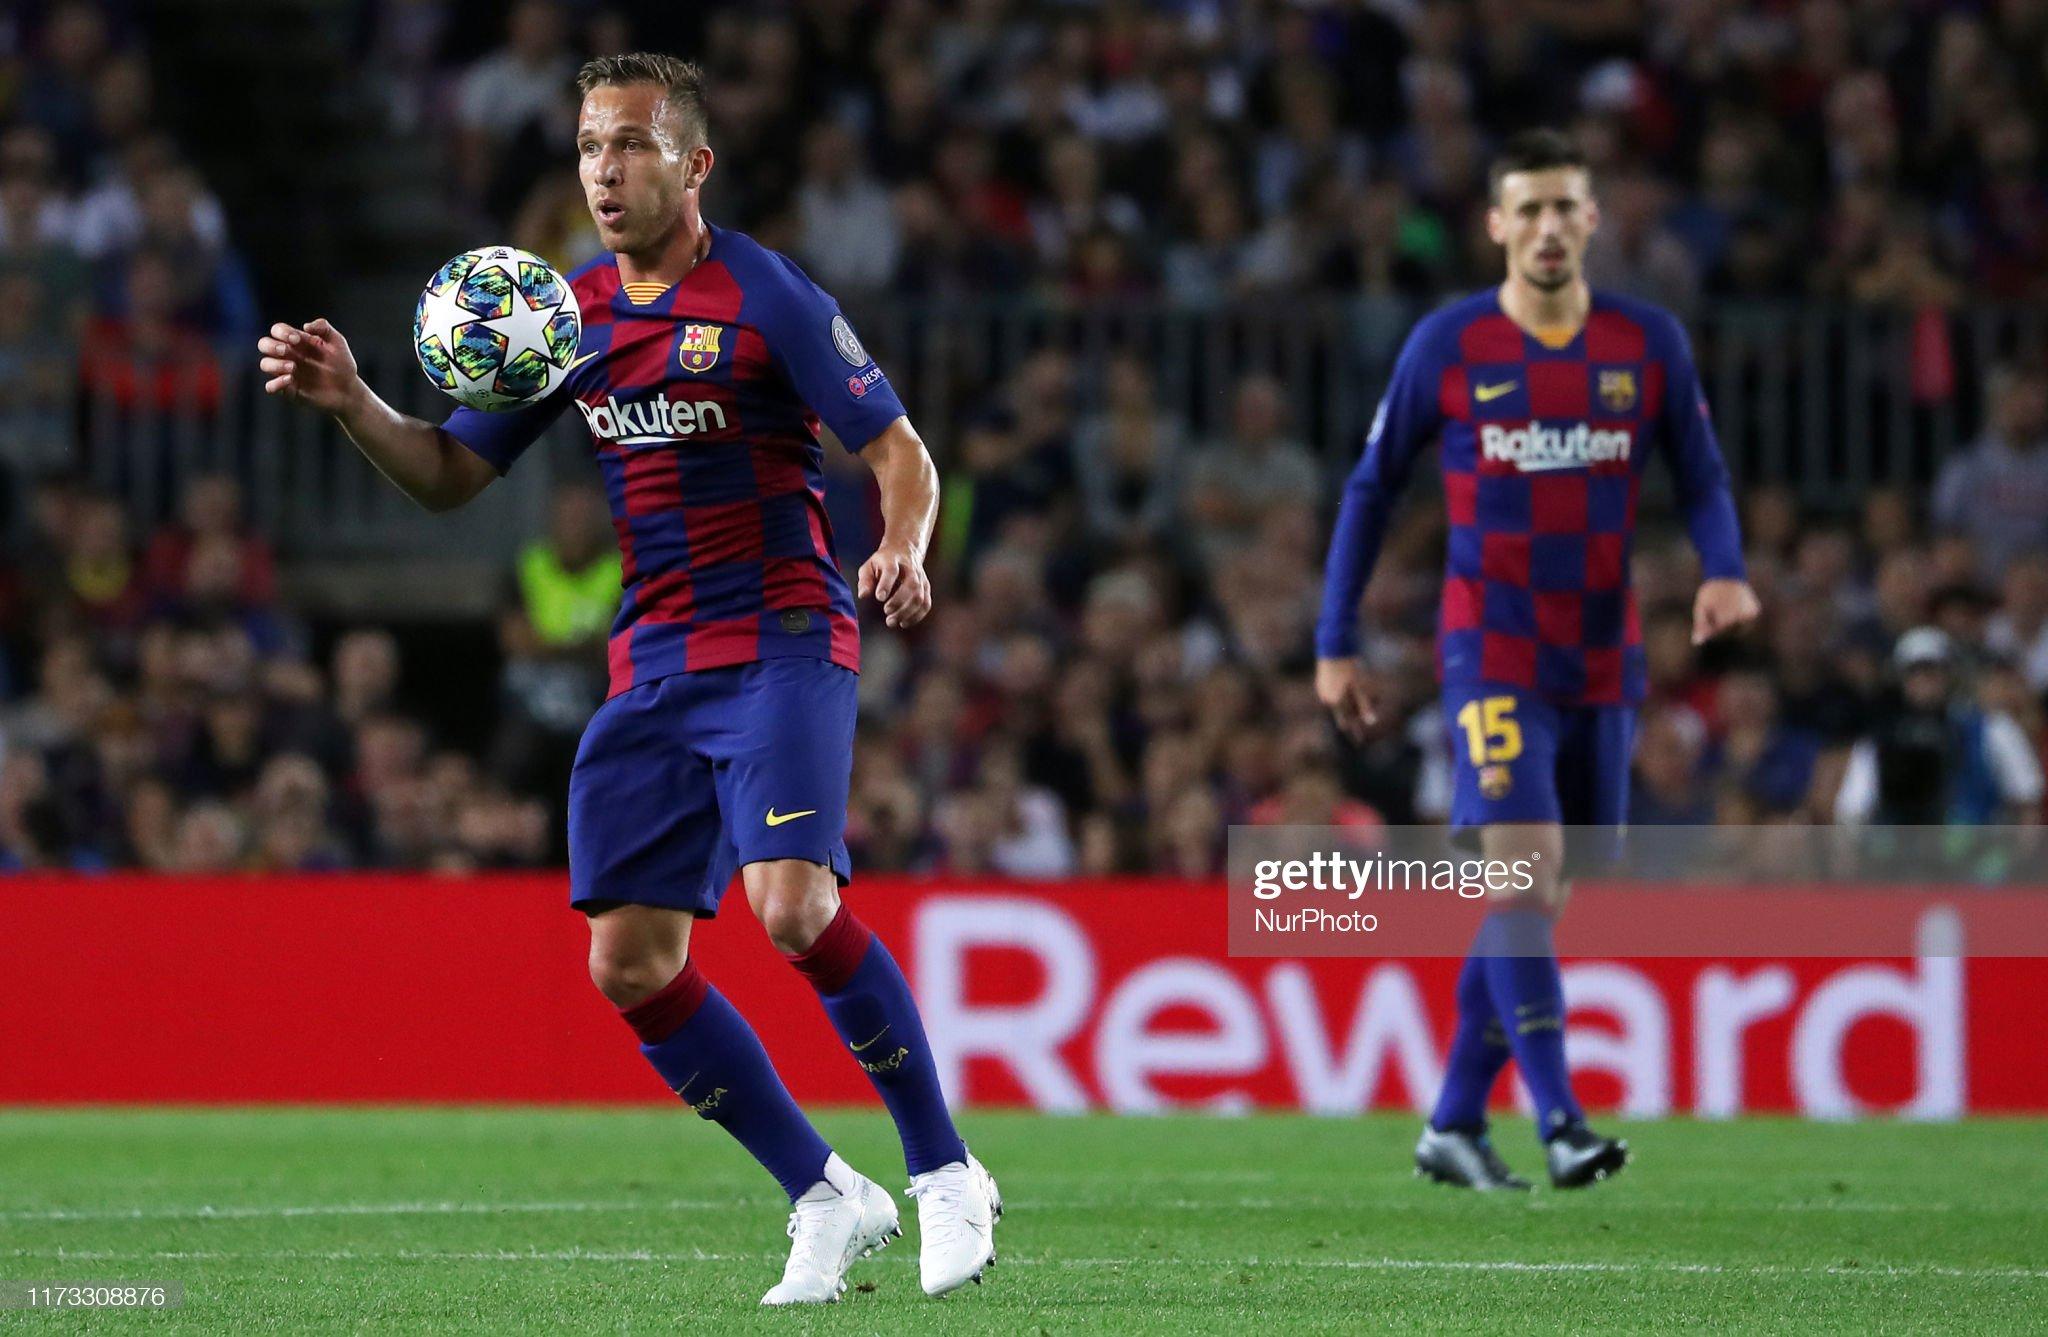 صور مباراة : برشلونة - إنتر 2-1 ( 02-10-2019 )  Arthur-melo-during-the-match-between-fc-barcelona-between-inter-to-picture-id1173308876?s=2048x2048